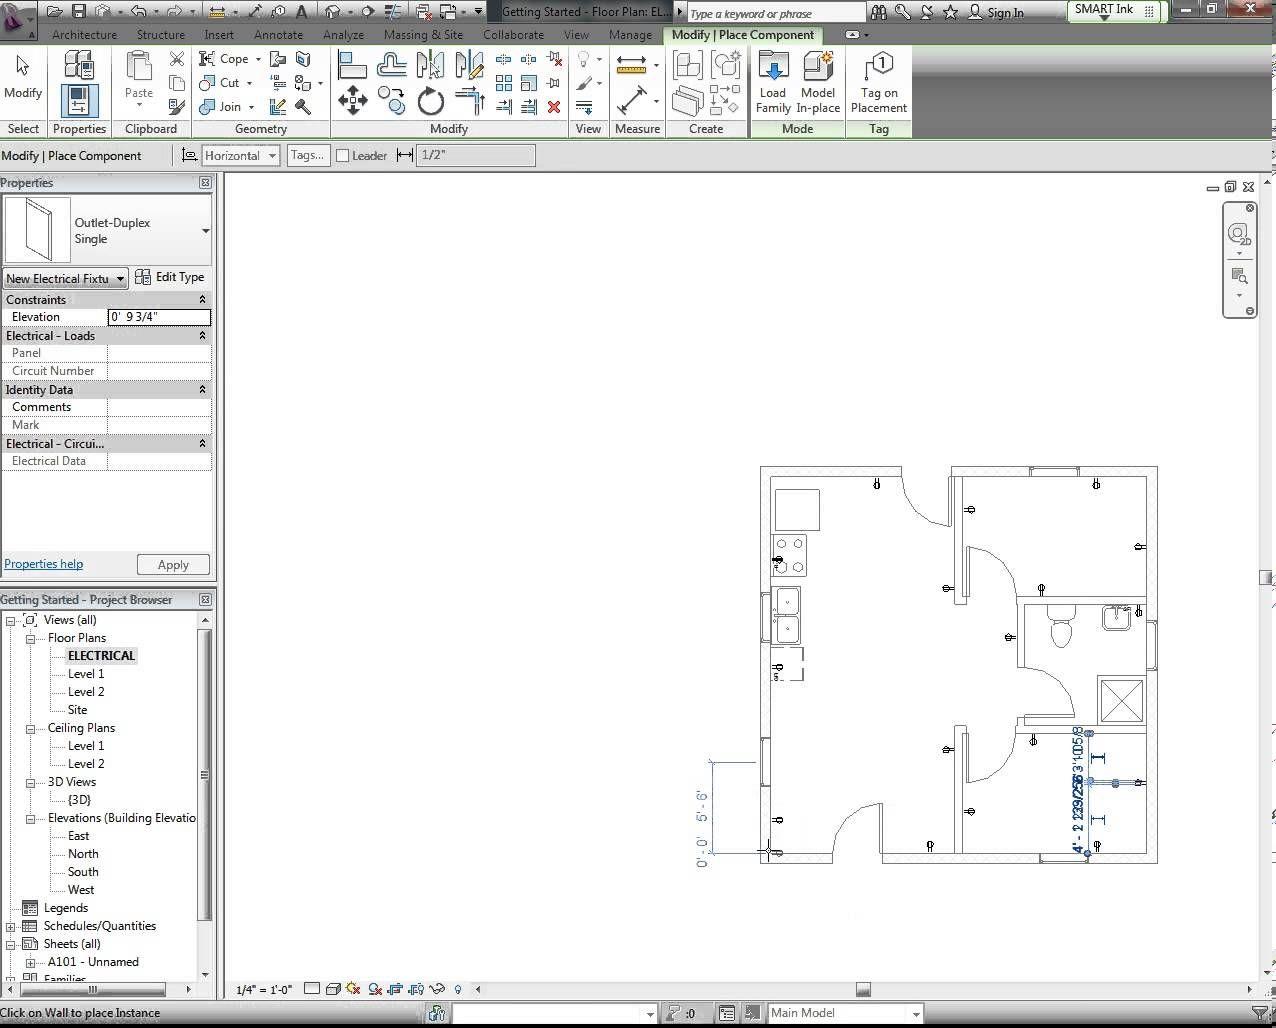 revit tutorial electrical plan part 1 [ 1276 x 1028 Pixel ]